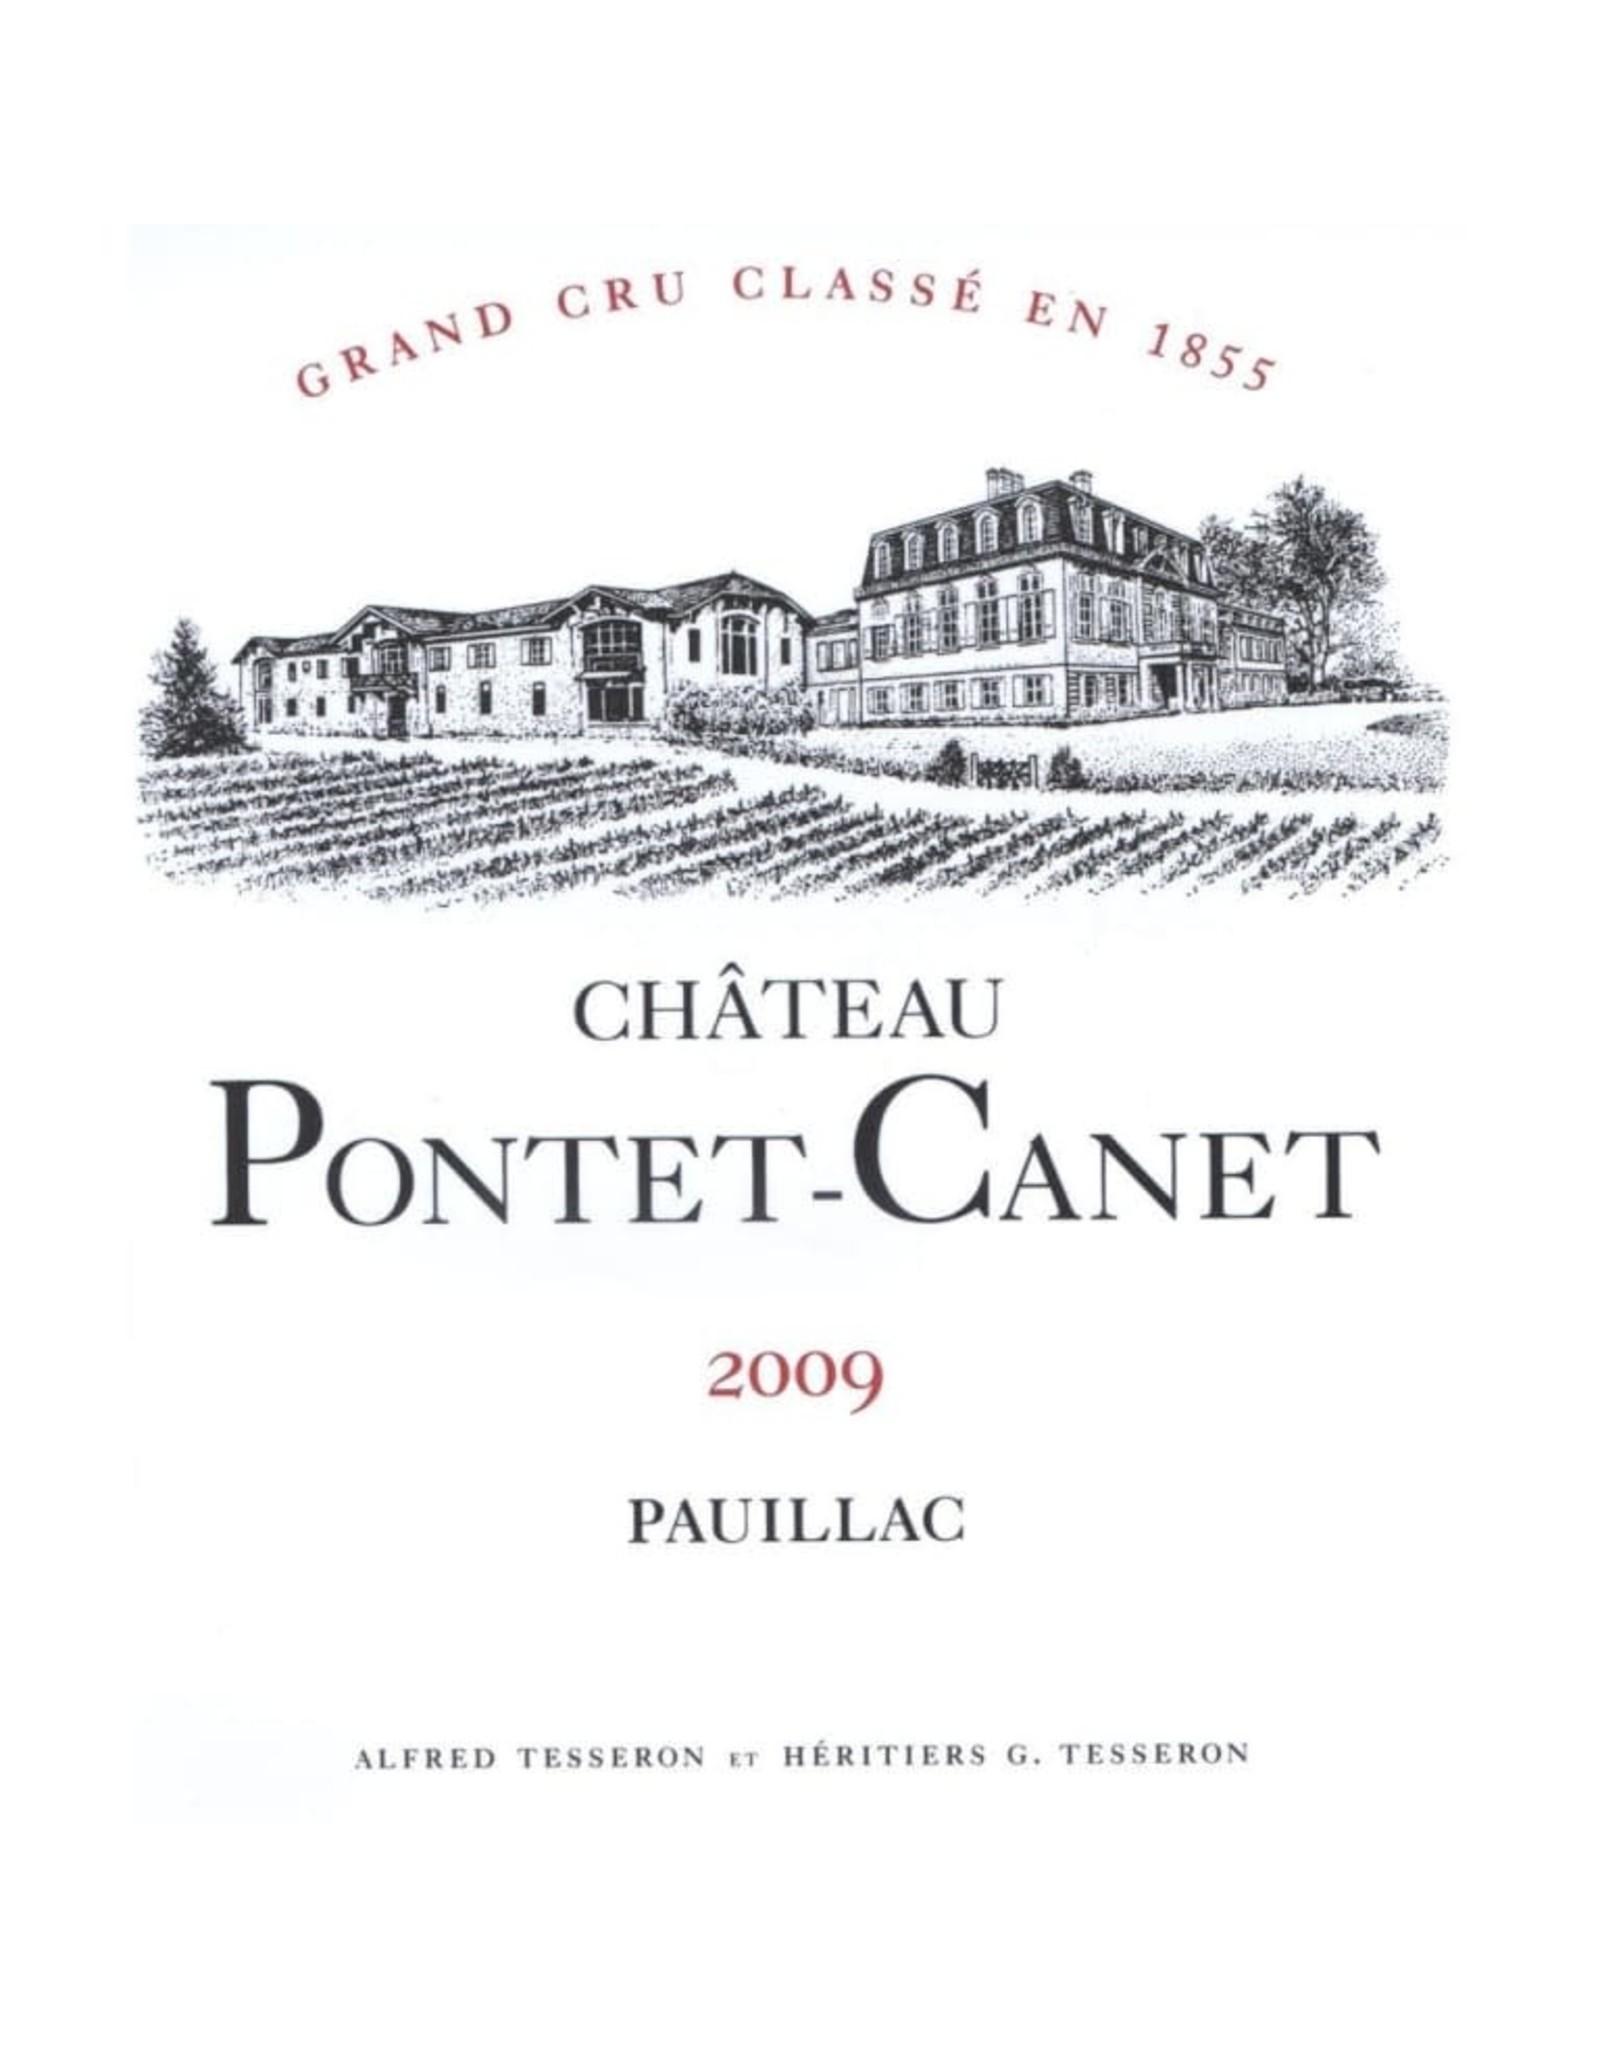 Chateau Pontet Canet Chateau Pontet-Canet, Pauillac 2009